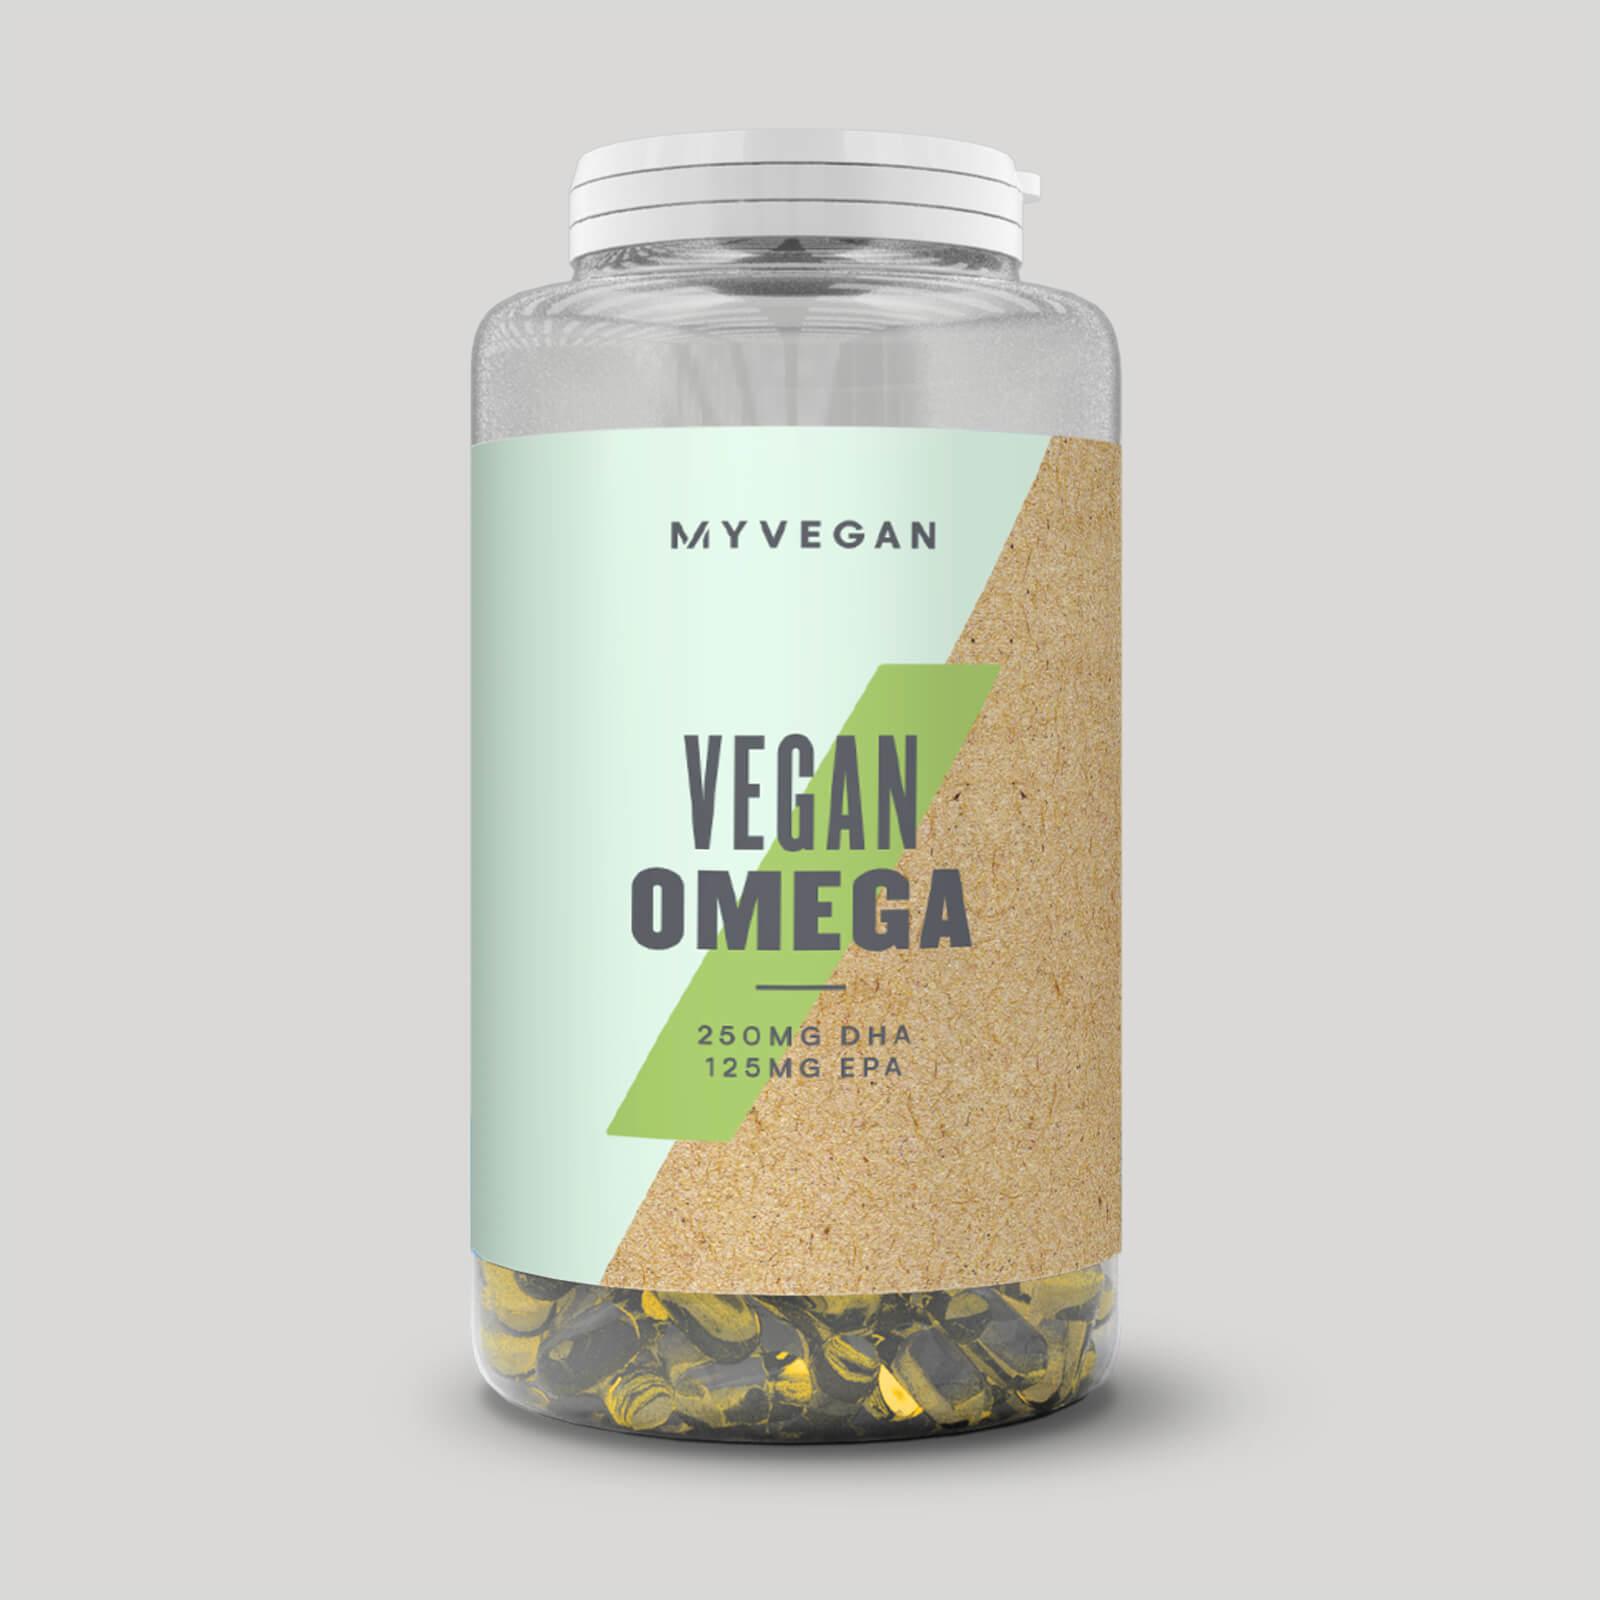 Omega 3 Vegan MyProtein